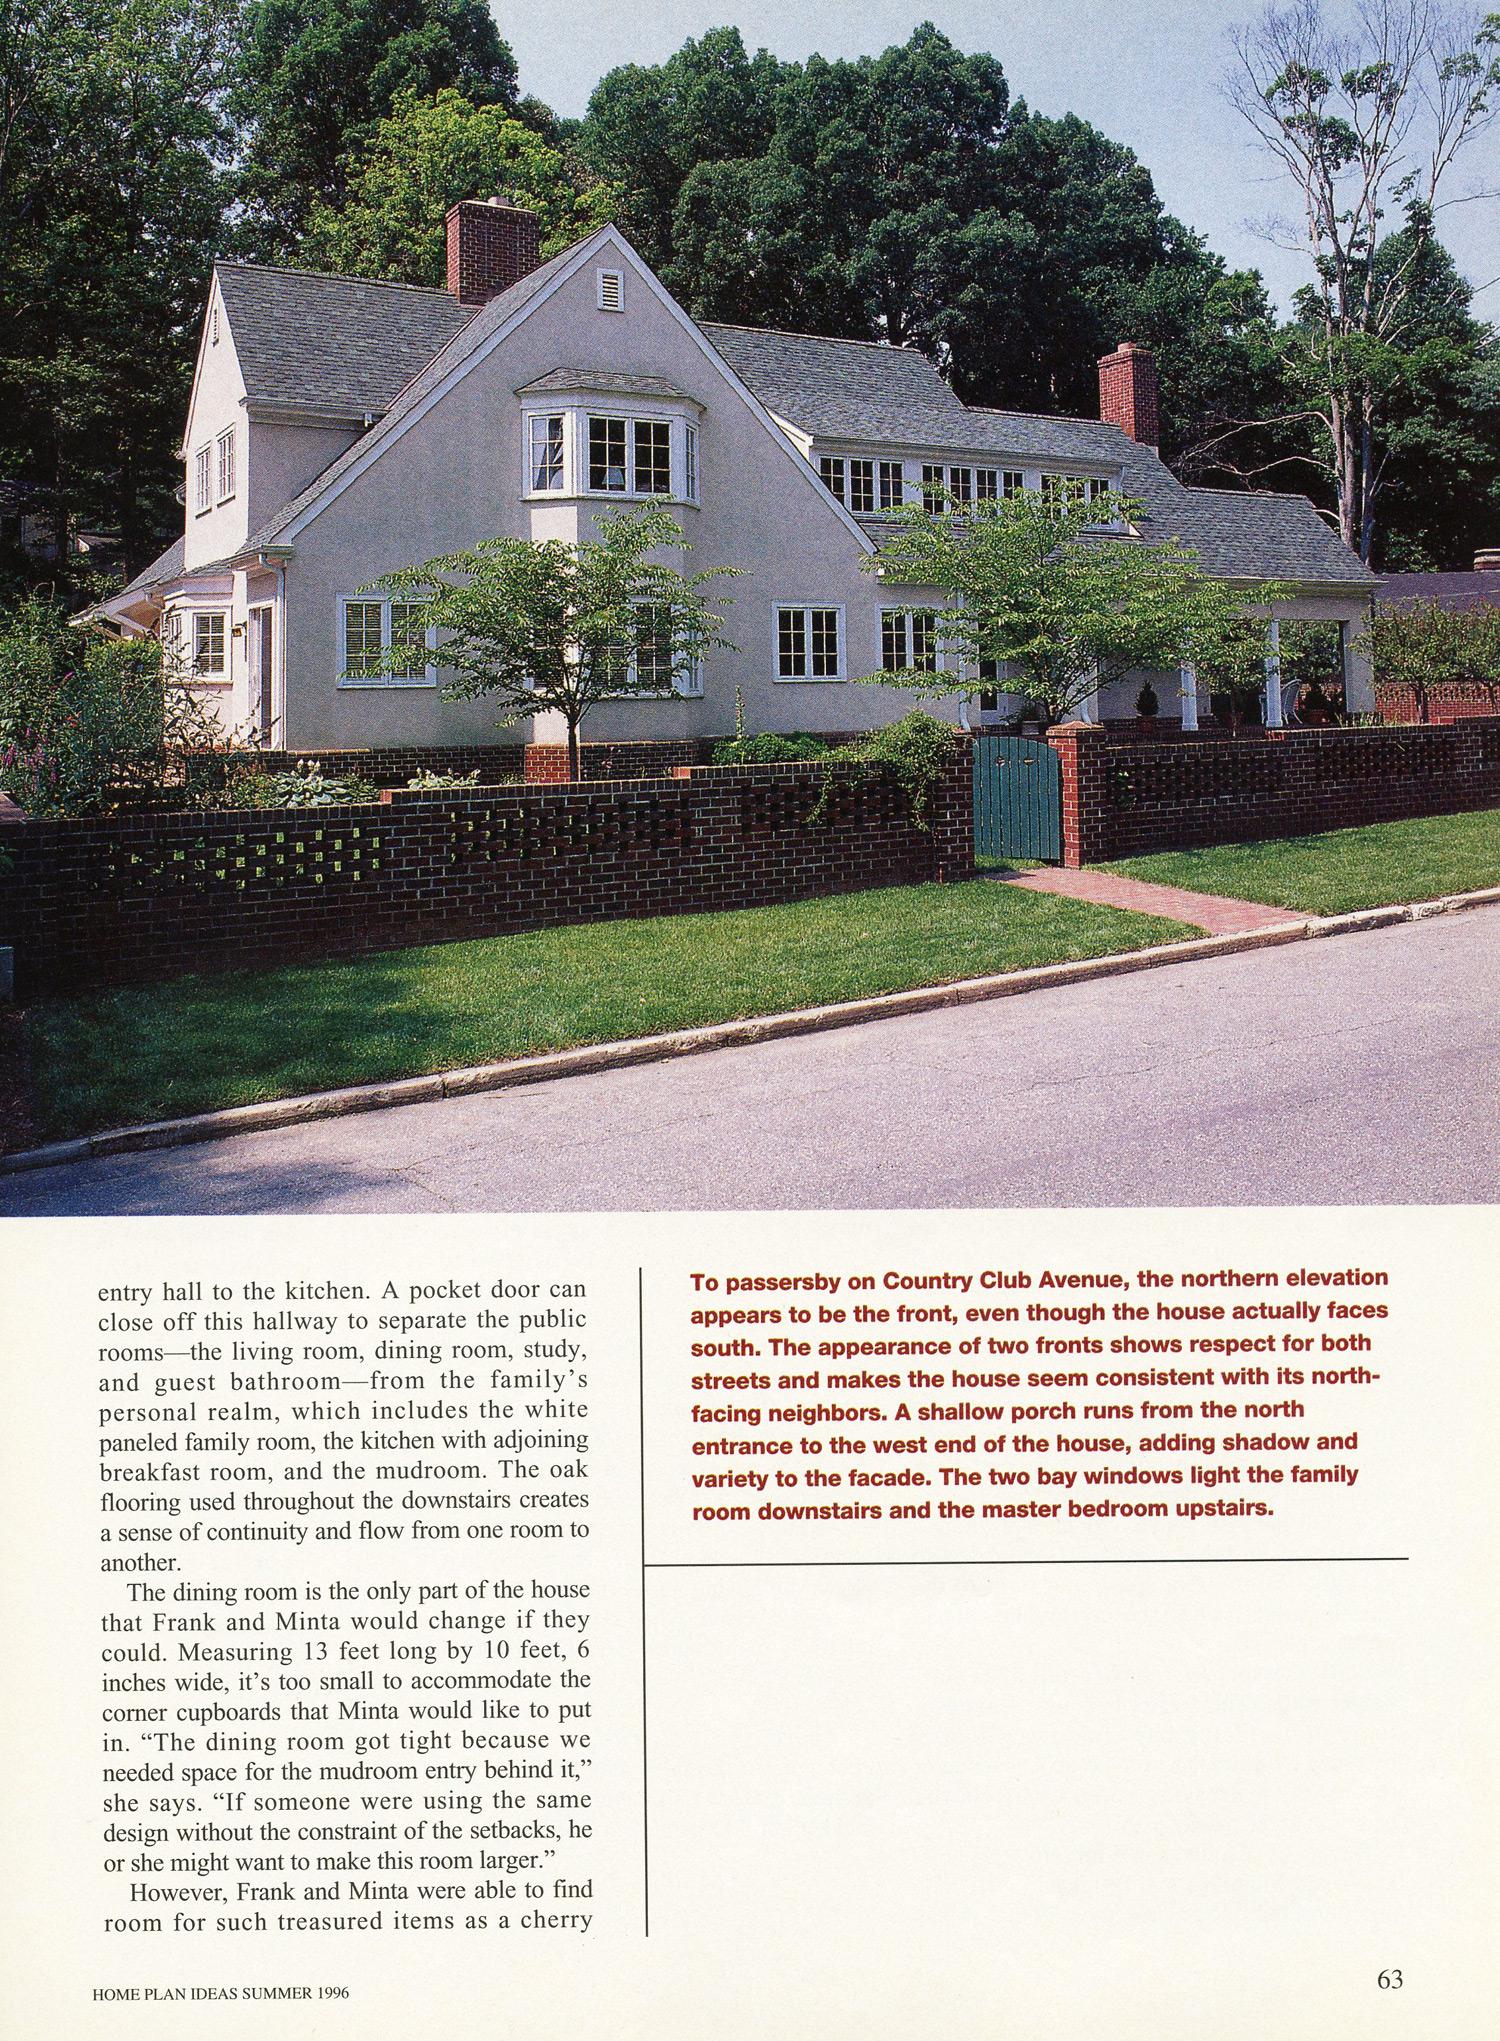 home-plan-ideas-summer-1996-frank-cheney-architect-7.jpg